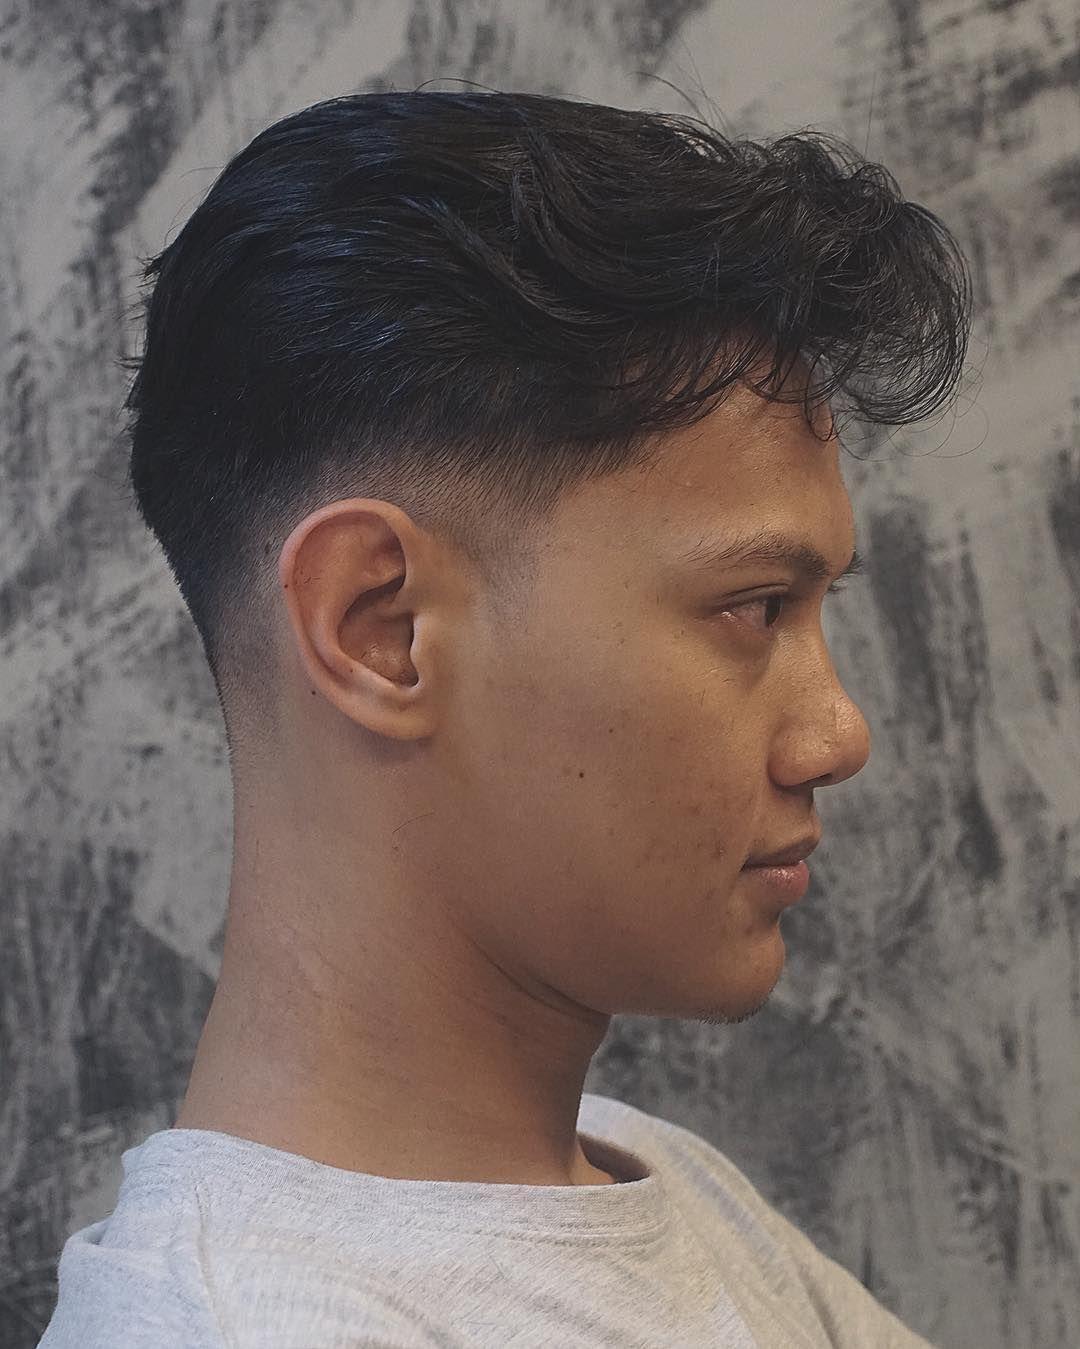 47 Wavy Asian Hairstyles Image In 2020 Asian Men Hairstyle Wavy Hair Men Medium Hair Styles